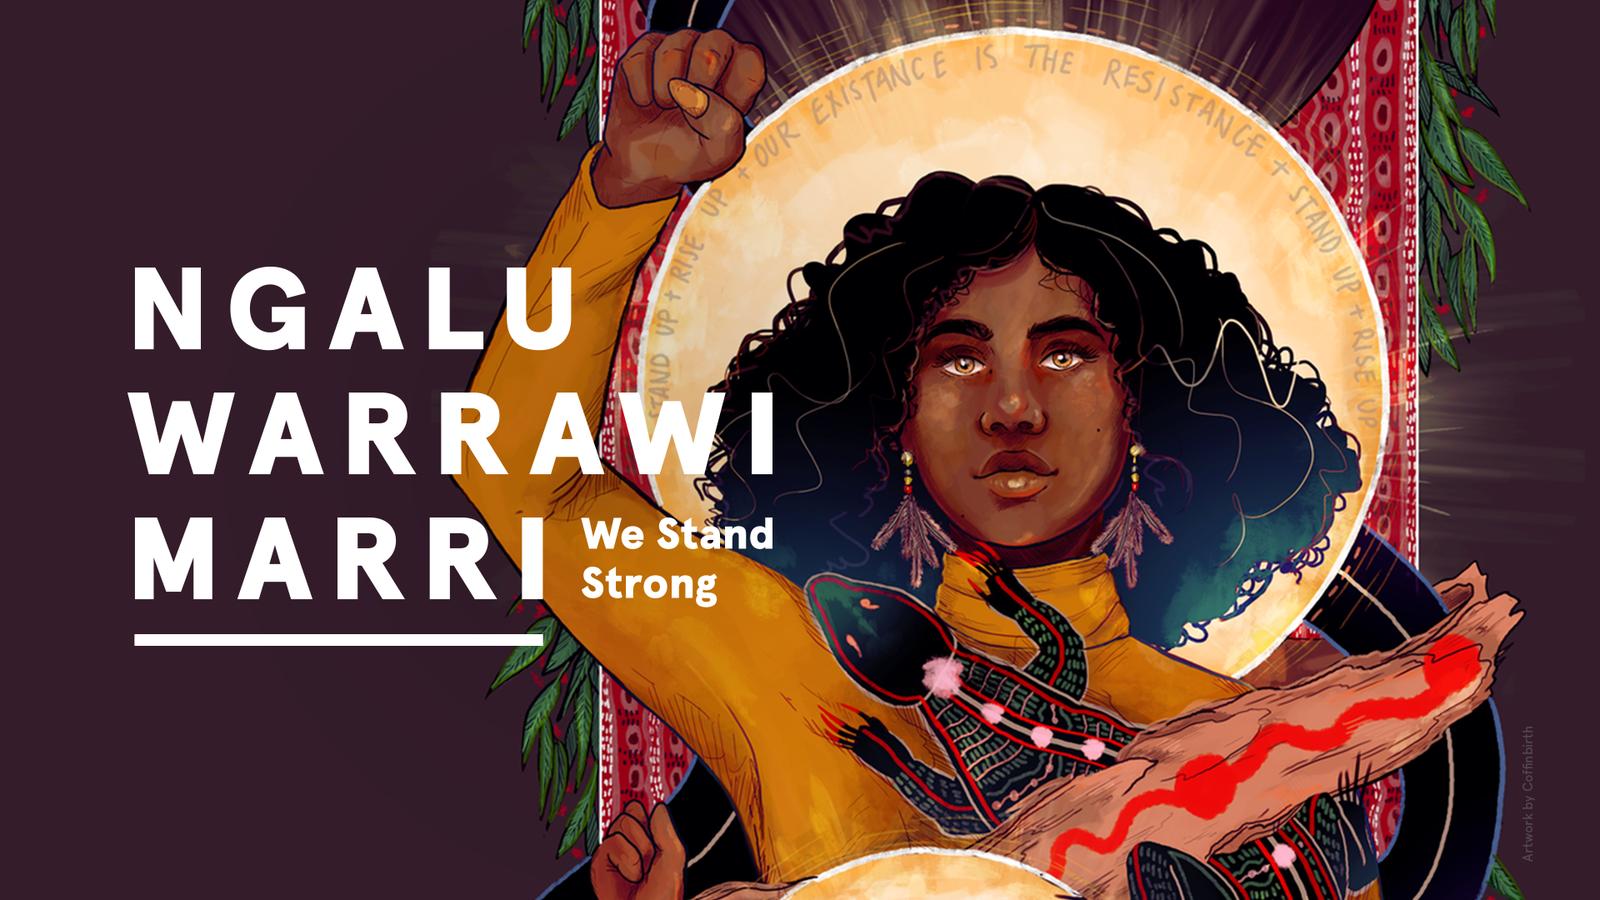 Ngalu Warrawi Marri (we stand strong) imagery